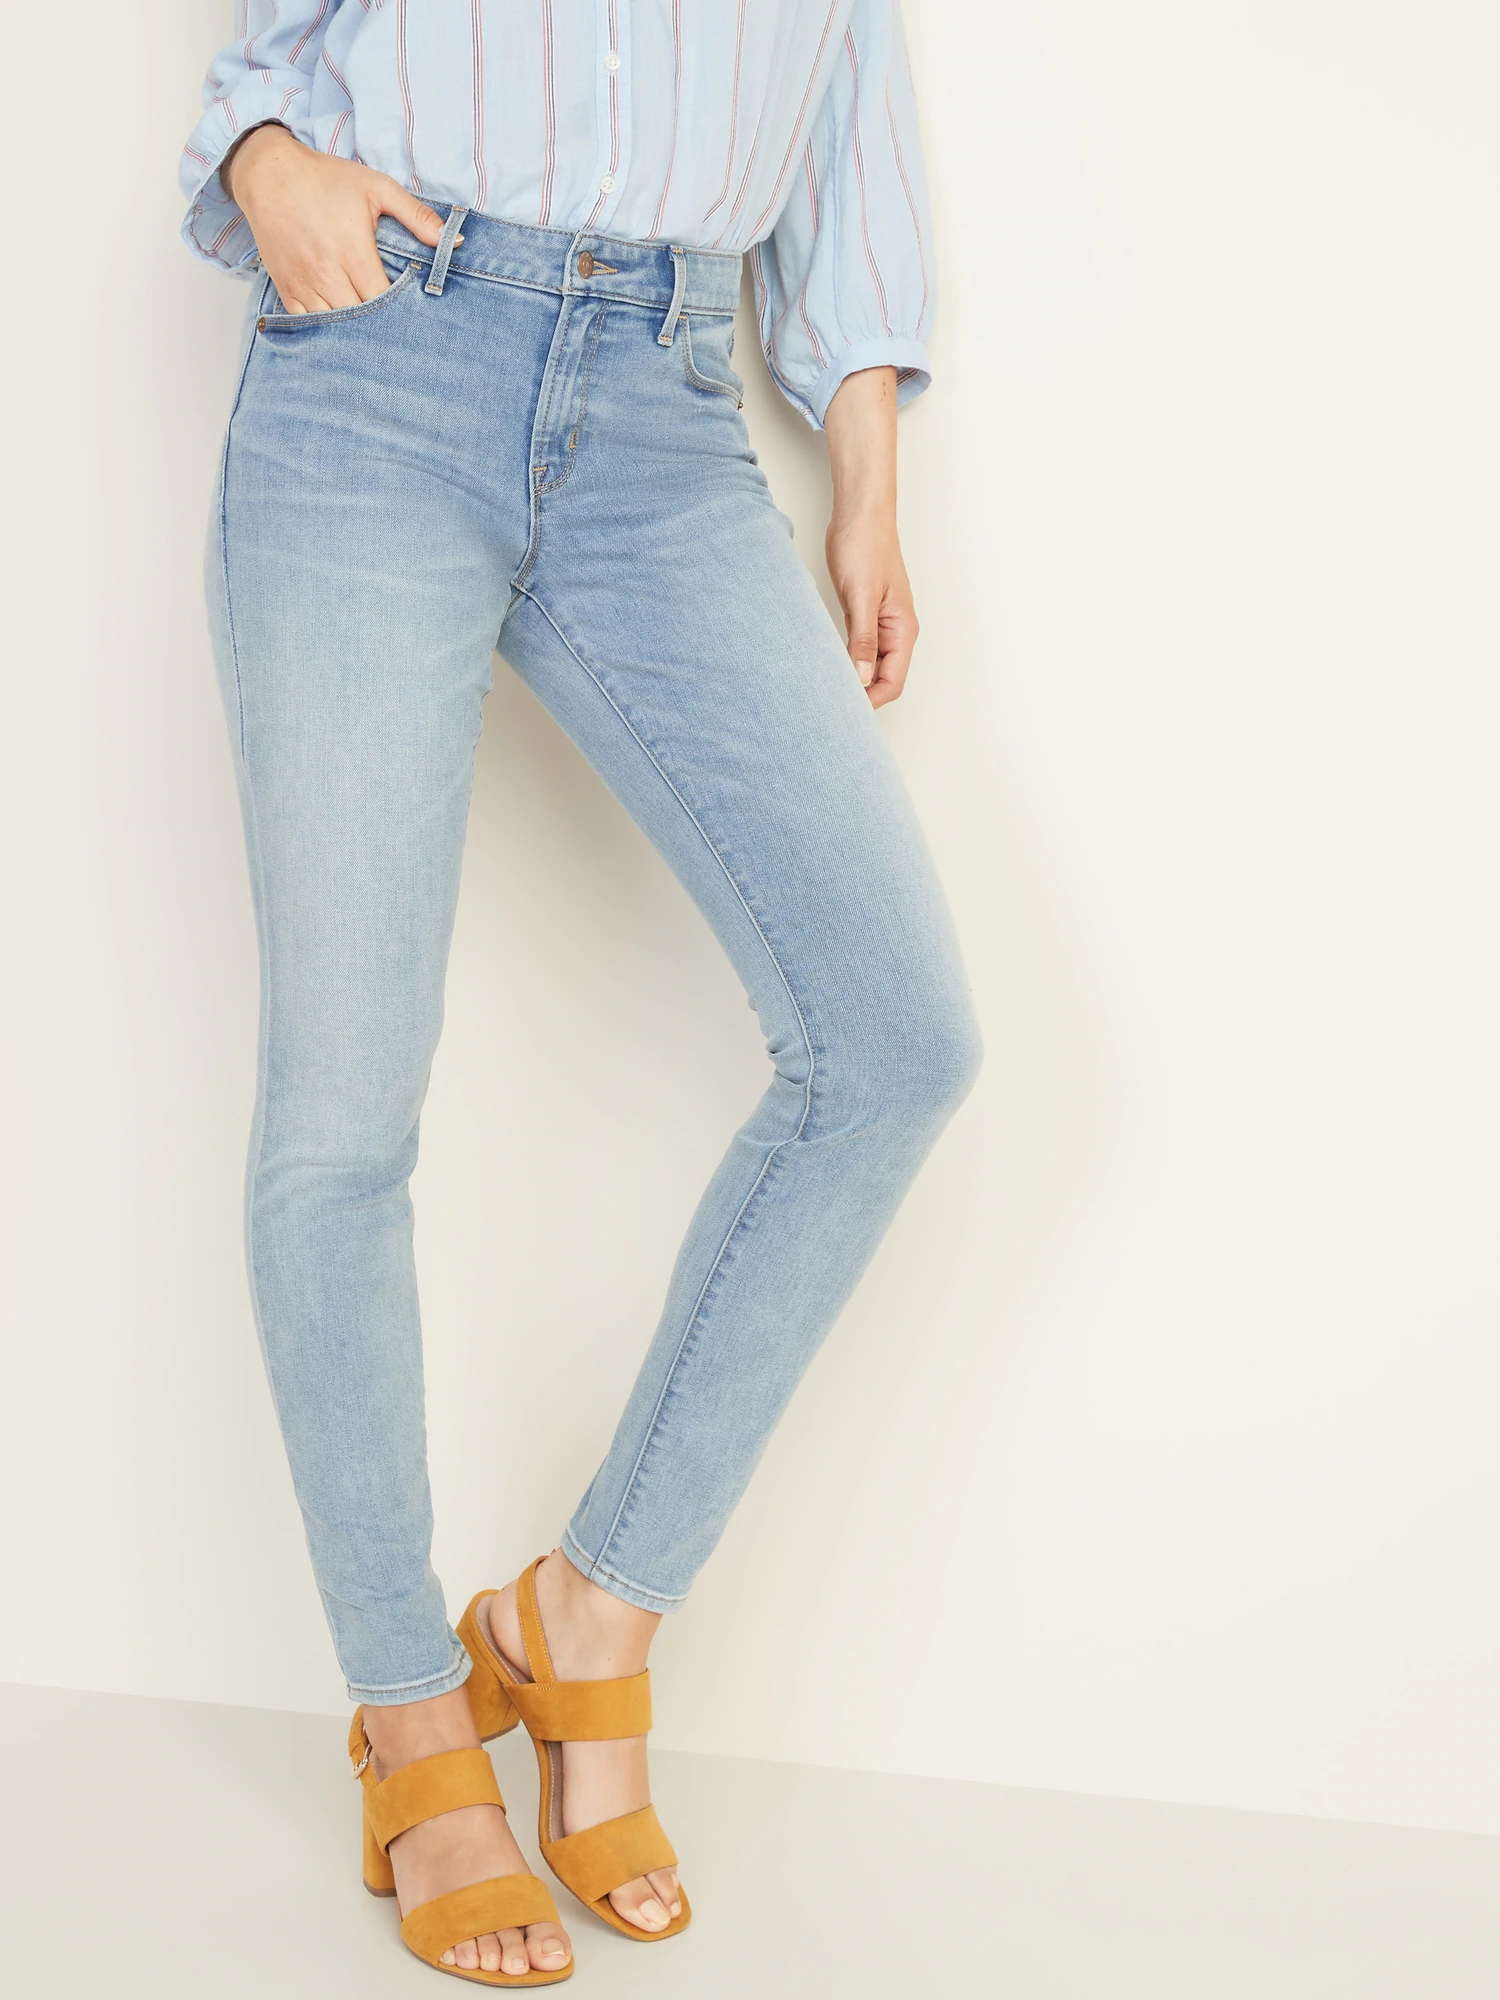 Old Navy Womens Size 4 or 8 Light Blue Wash Short Denim Jean Skirt New